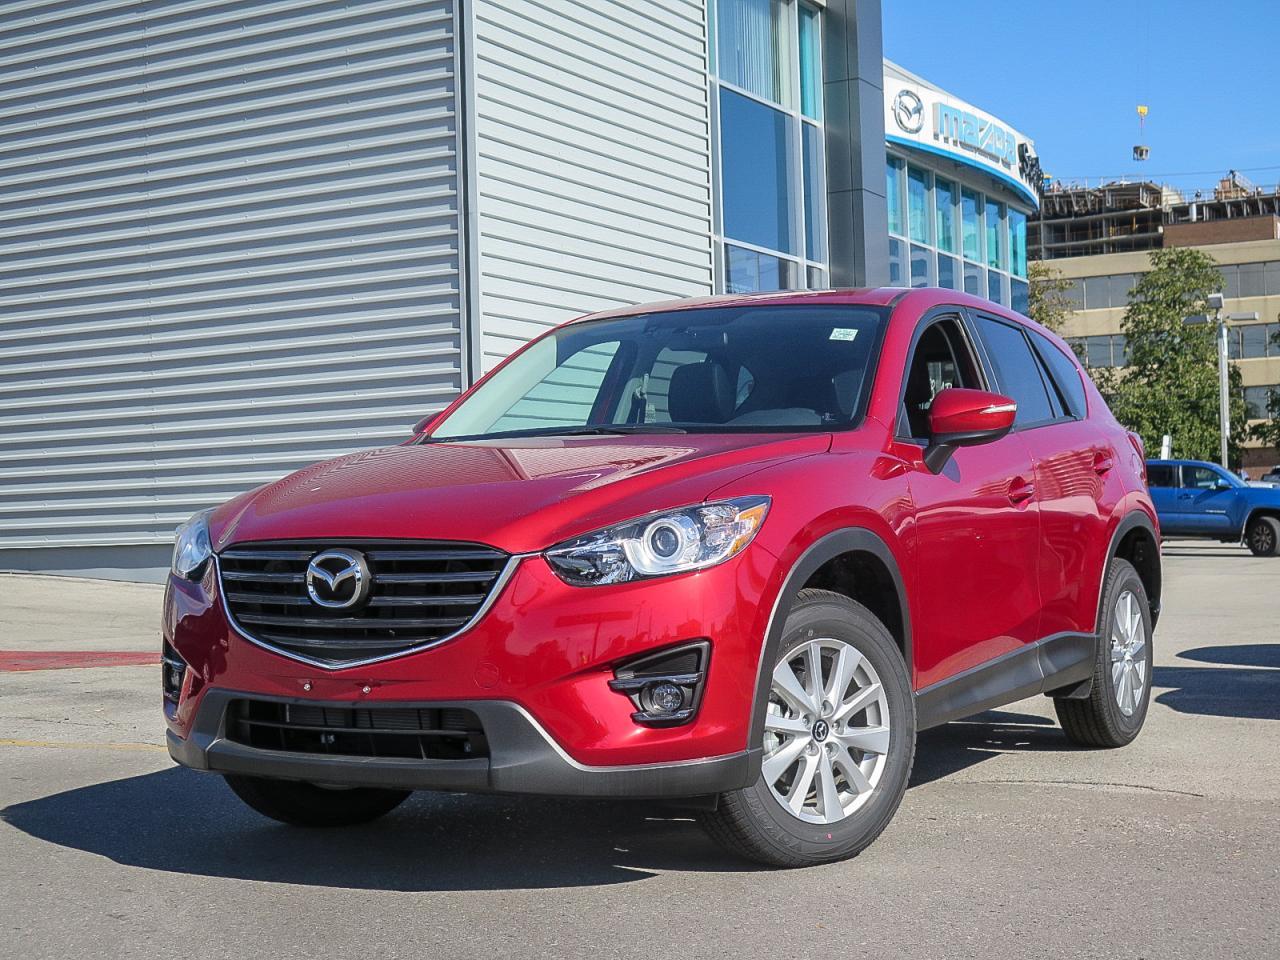 2016 Mazda CX-5 AWD LEATHER BRAND NEW